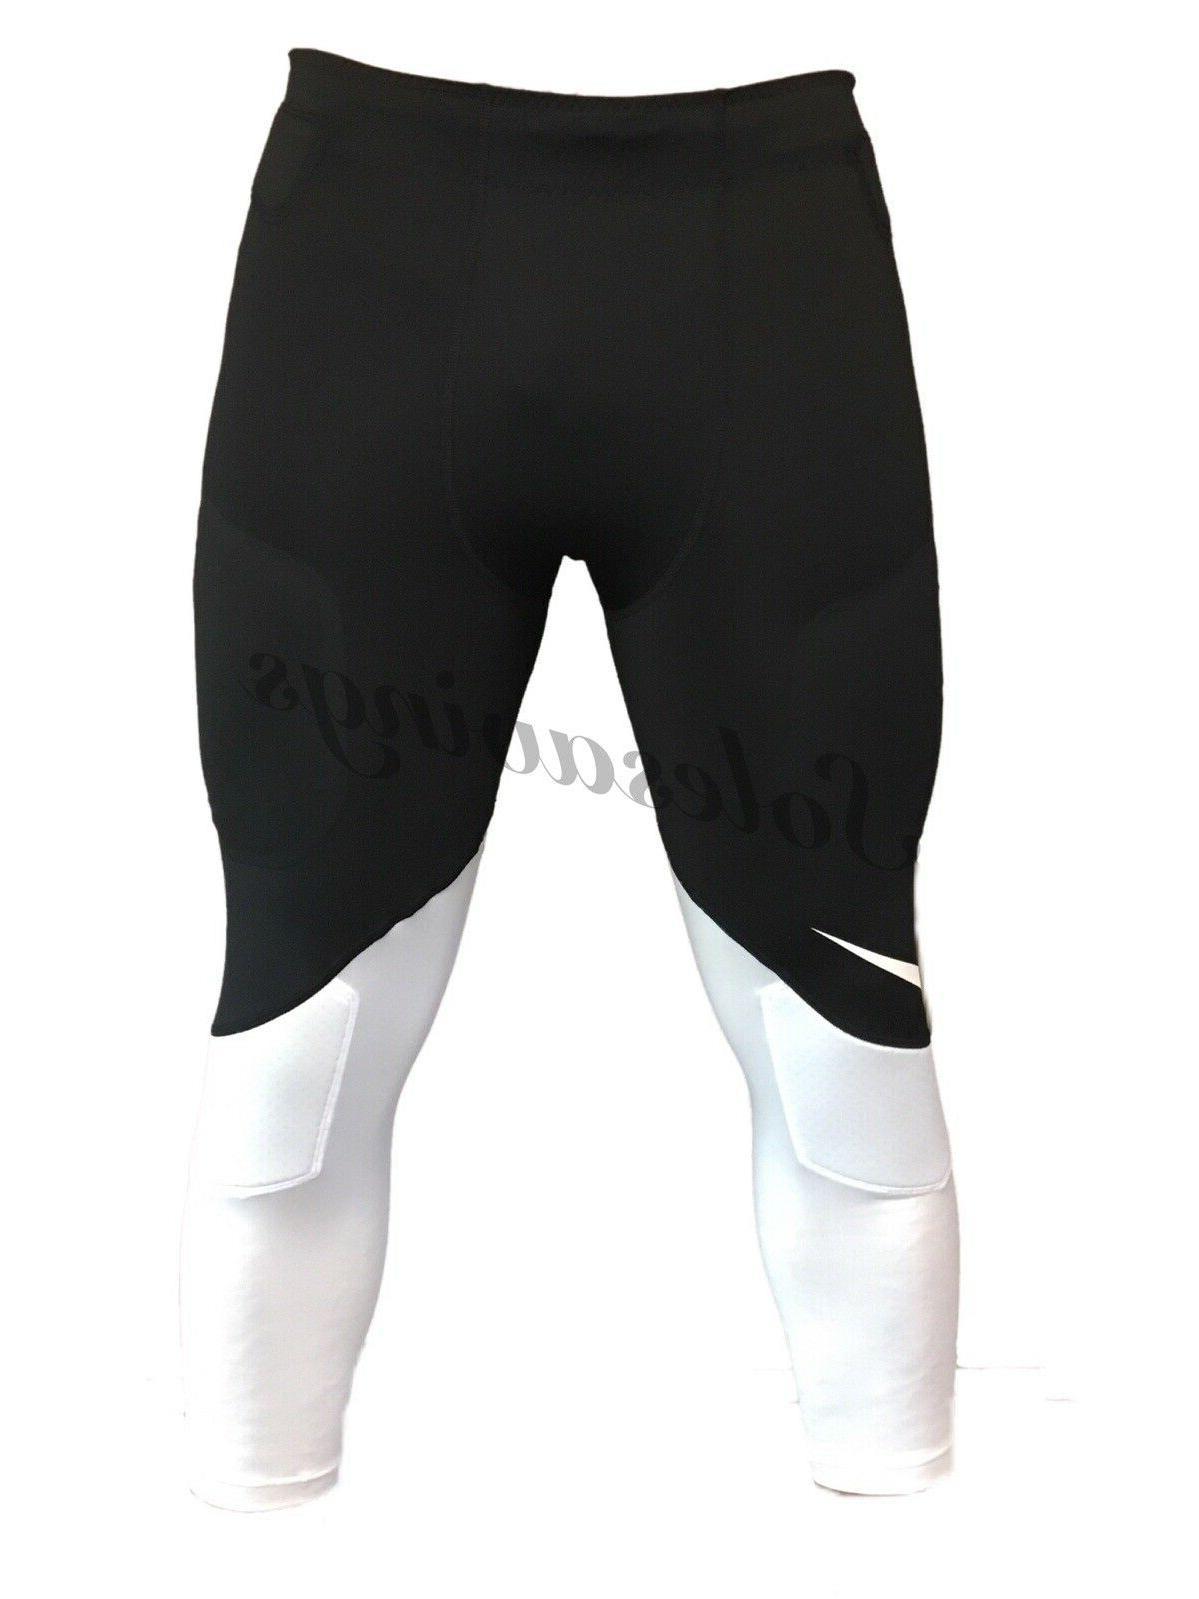 nike compression pants 3/4